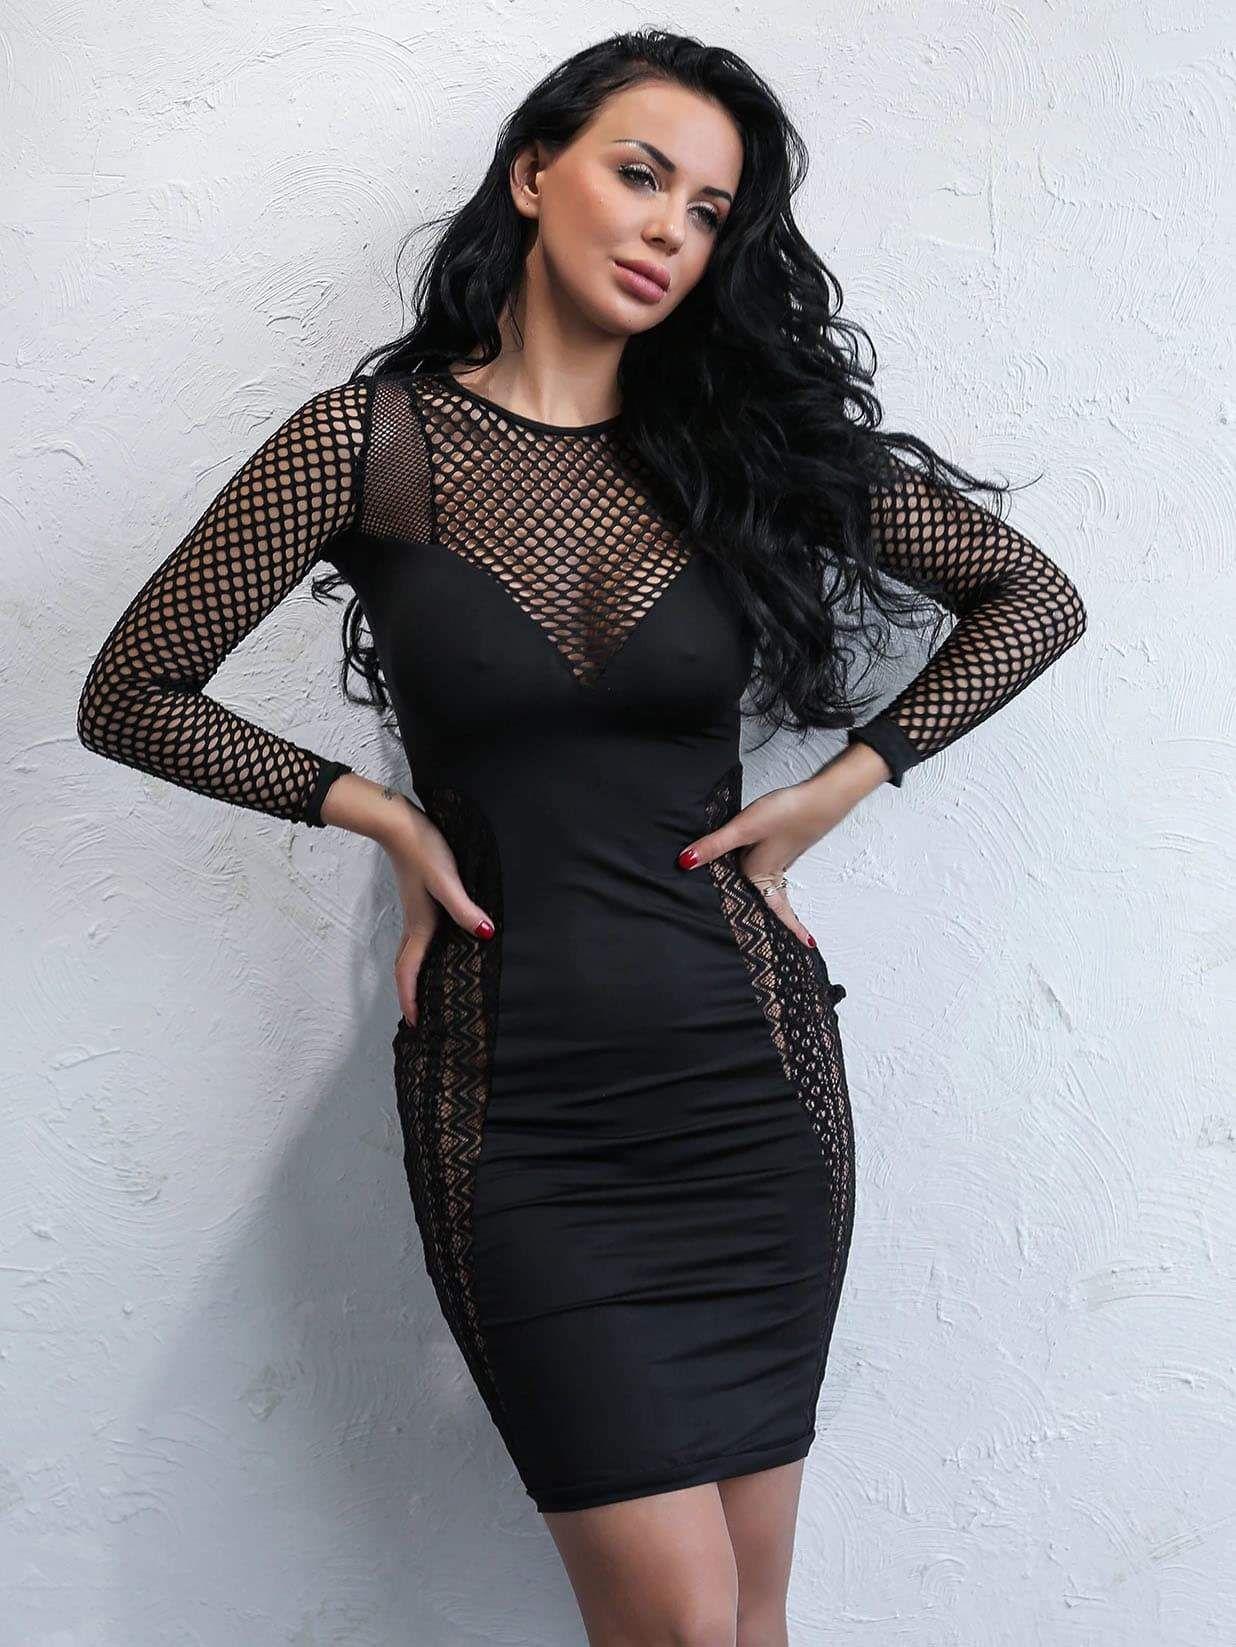 00c7d03ba5d5a Joyfunear Mesh Panel Lace Trim Bodycon Dress in 2019   Wish ...